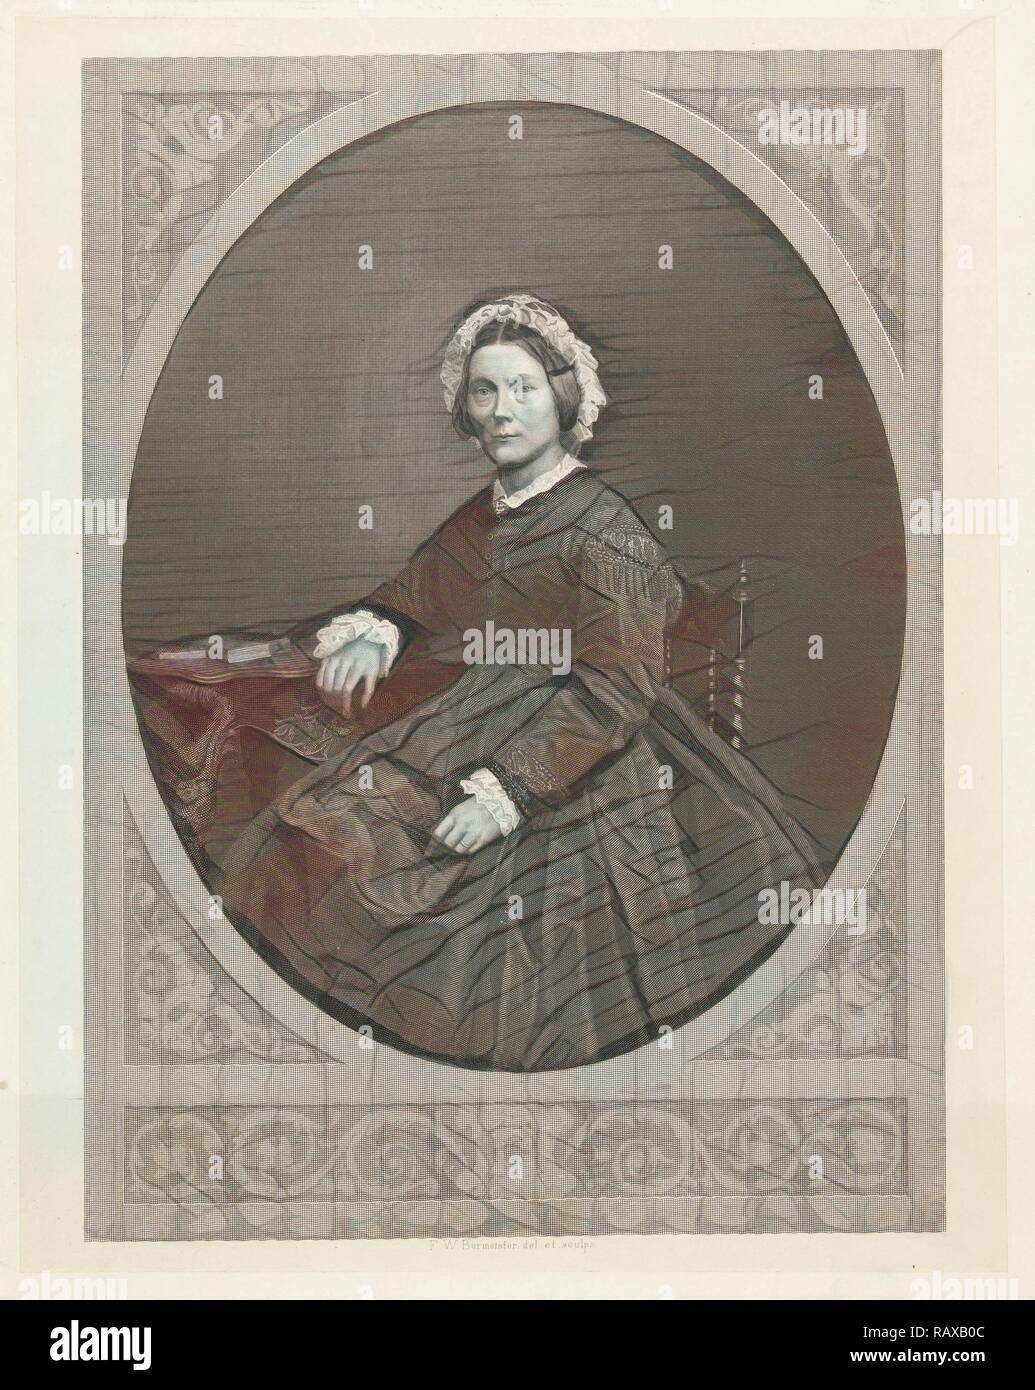 Portrait of Emma Boissevain - Nicholls, Friedrich Wilhelm Burmeister, 1855 - 1915. Reimagined by Gibon. Classic art reimagined - Stock Image